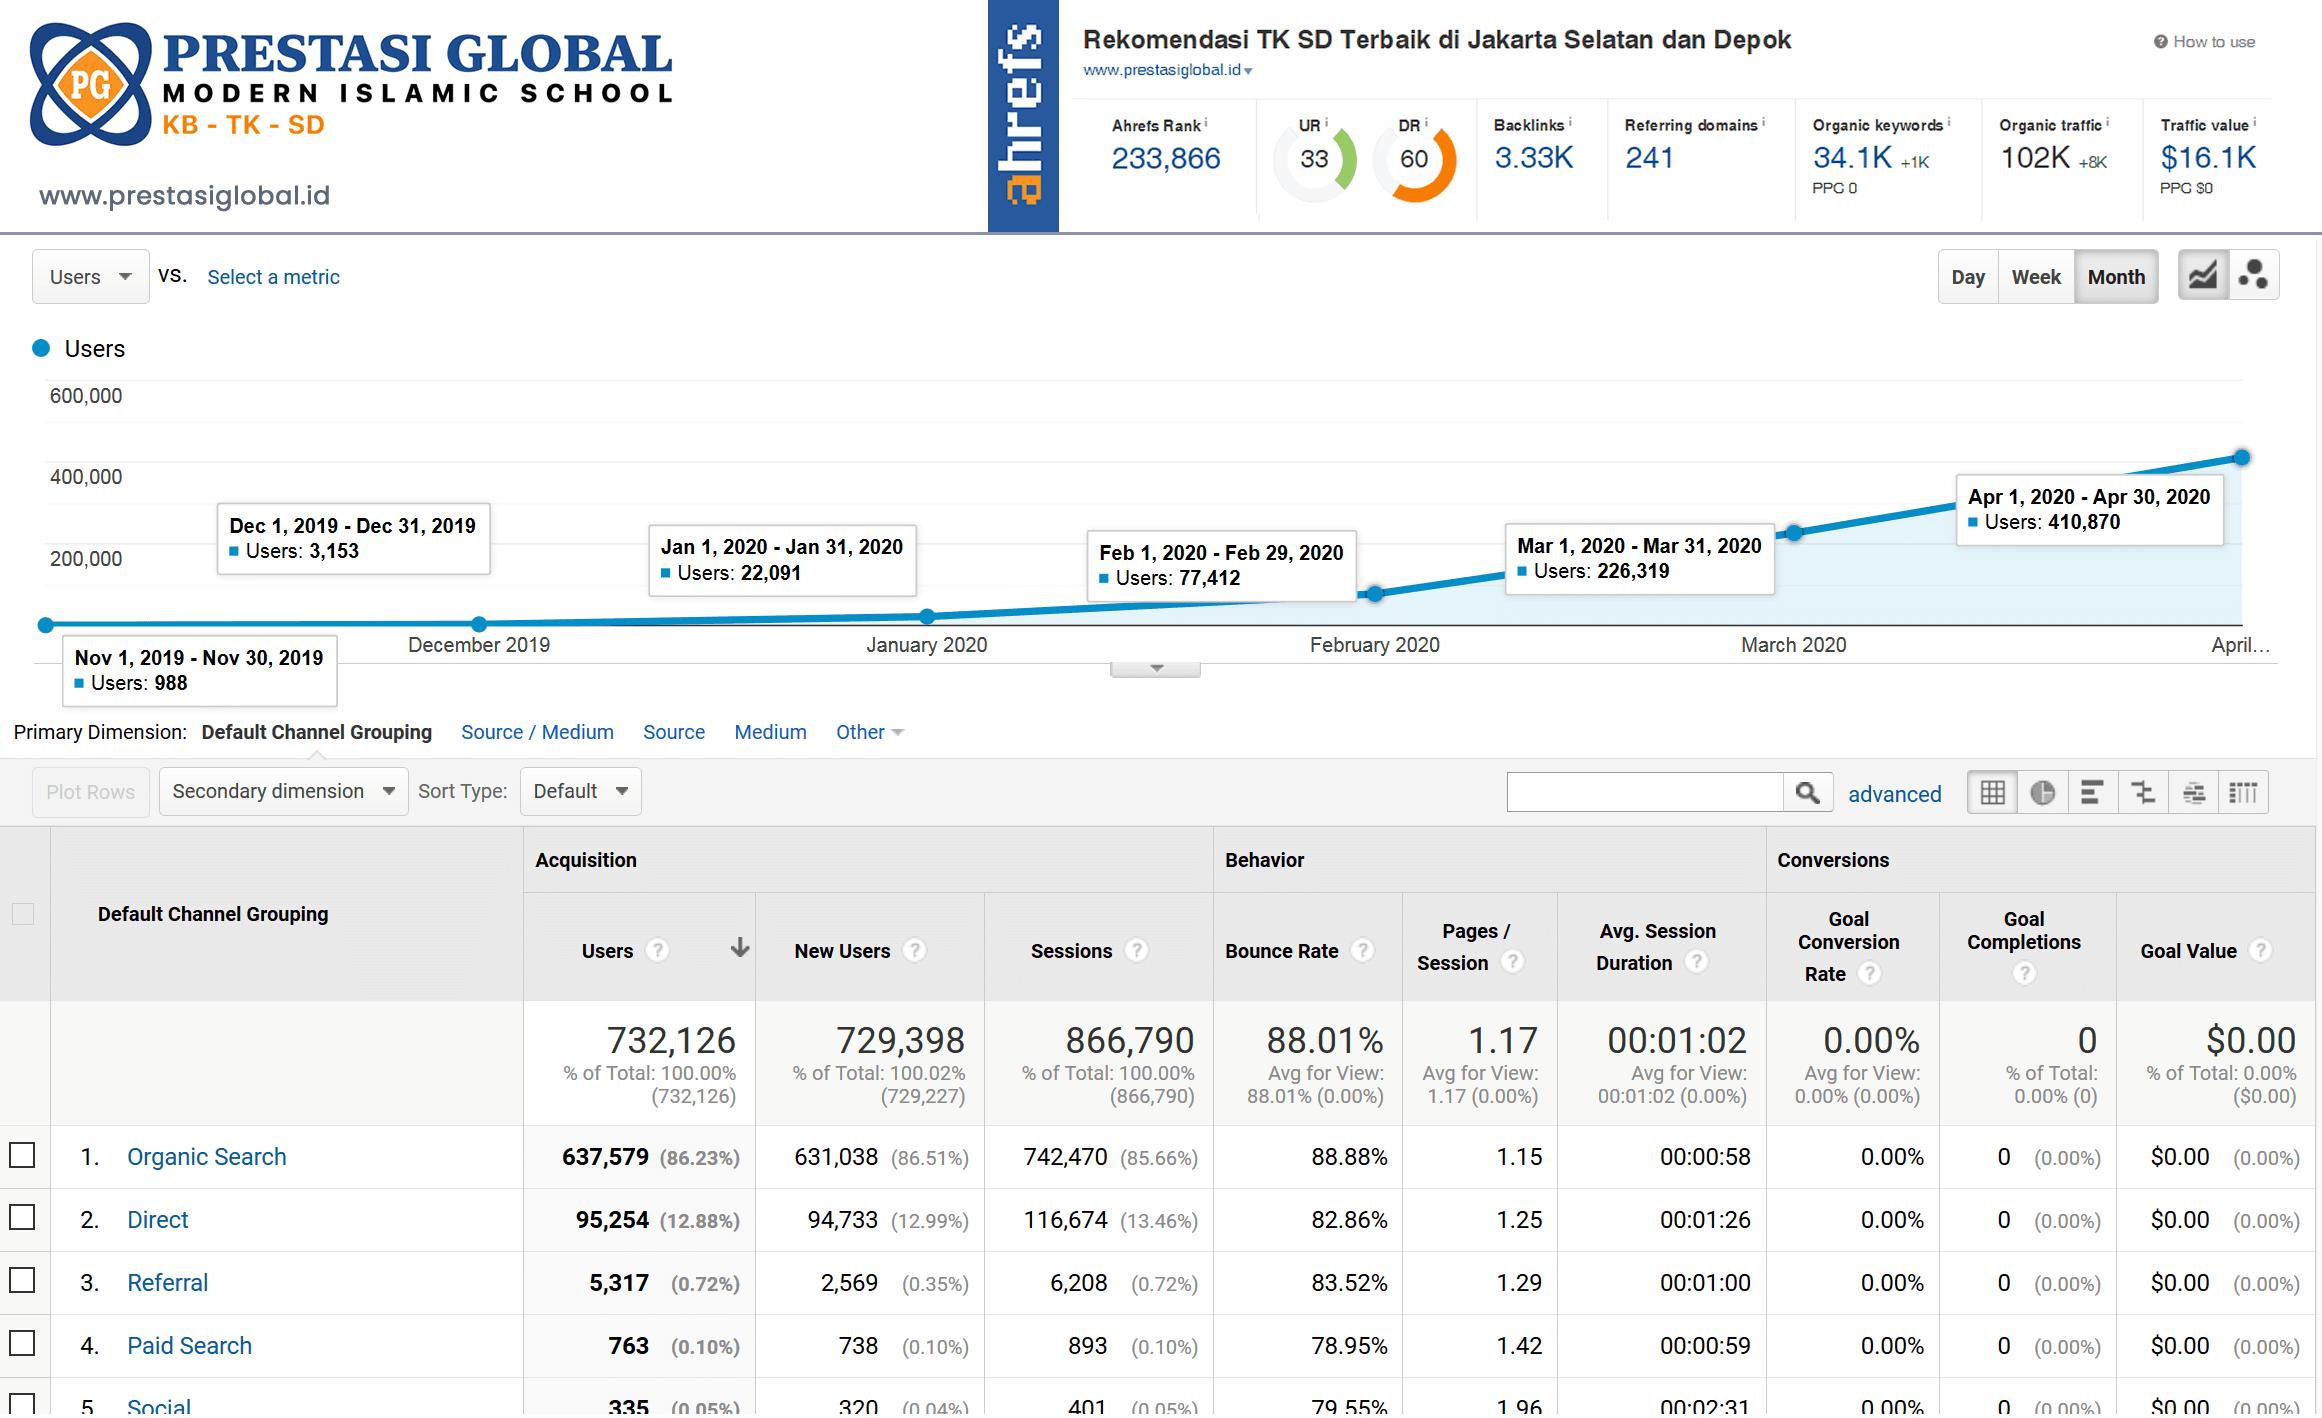 Berikut salah satu hasil Pekerjaan Arfadia dari mulai Pembelian Domain, Pembuatan Website Hingga Pengerjaan SEO All In One